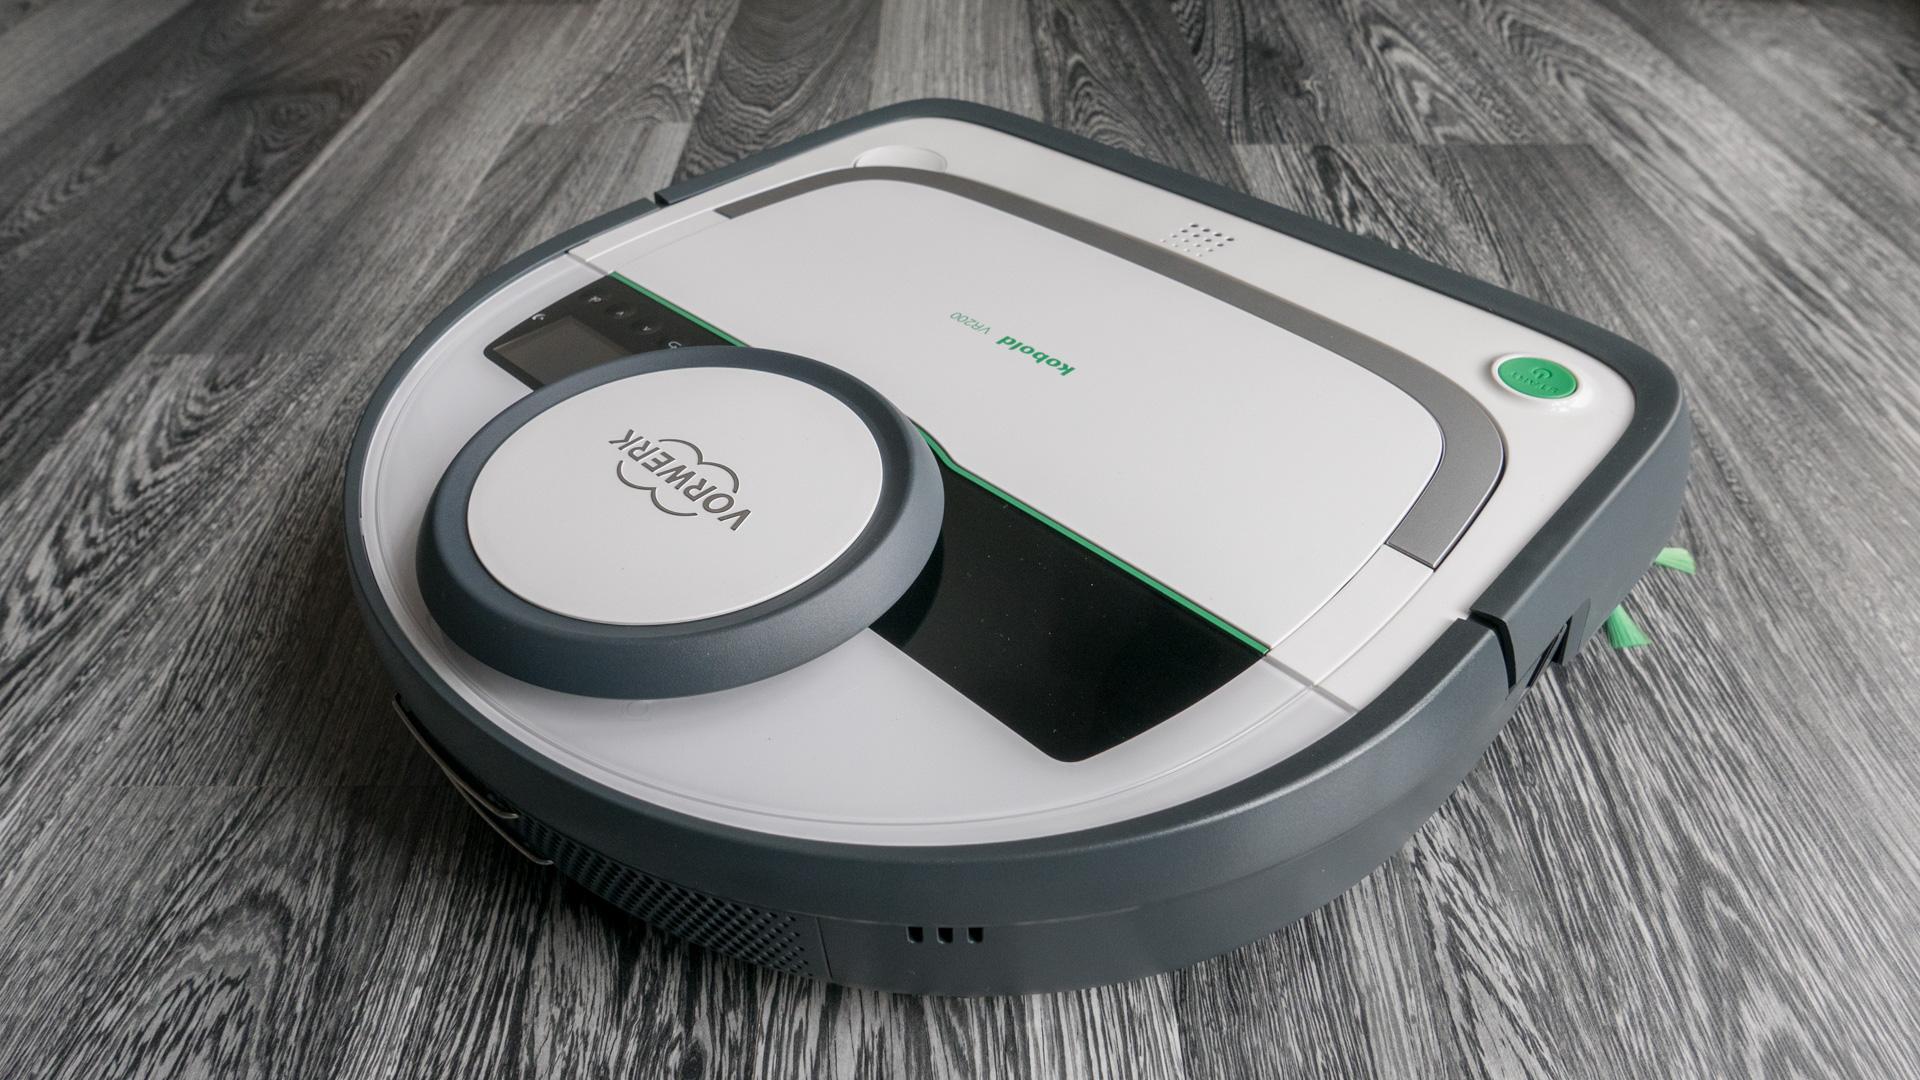 Vorwerk VR200 Details 06